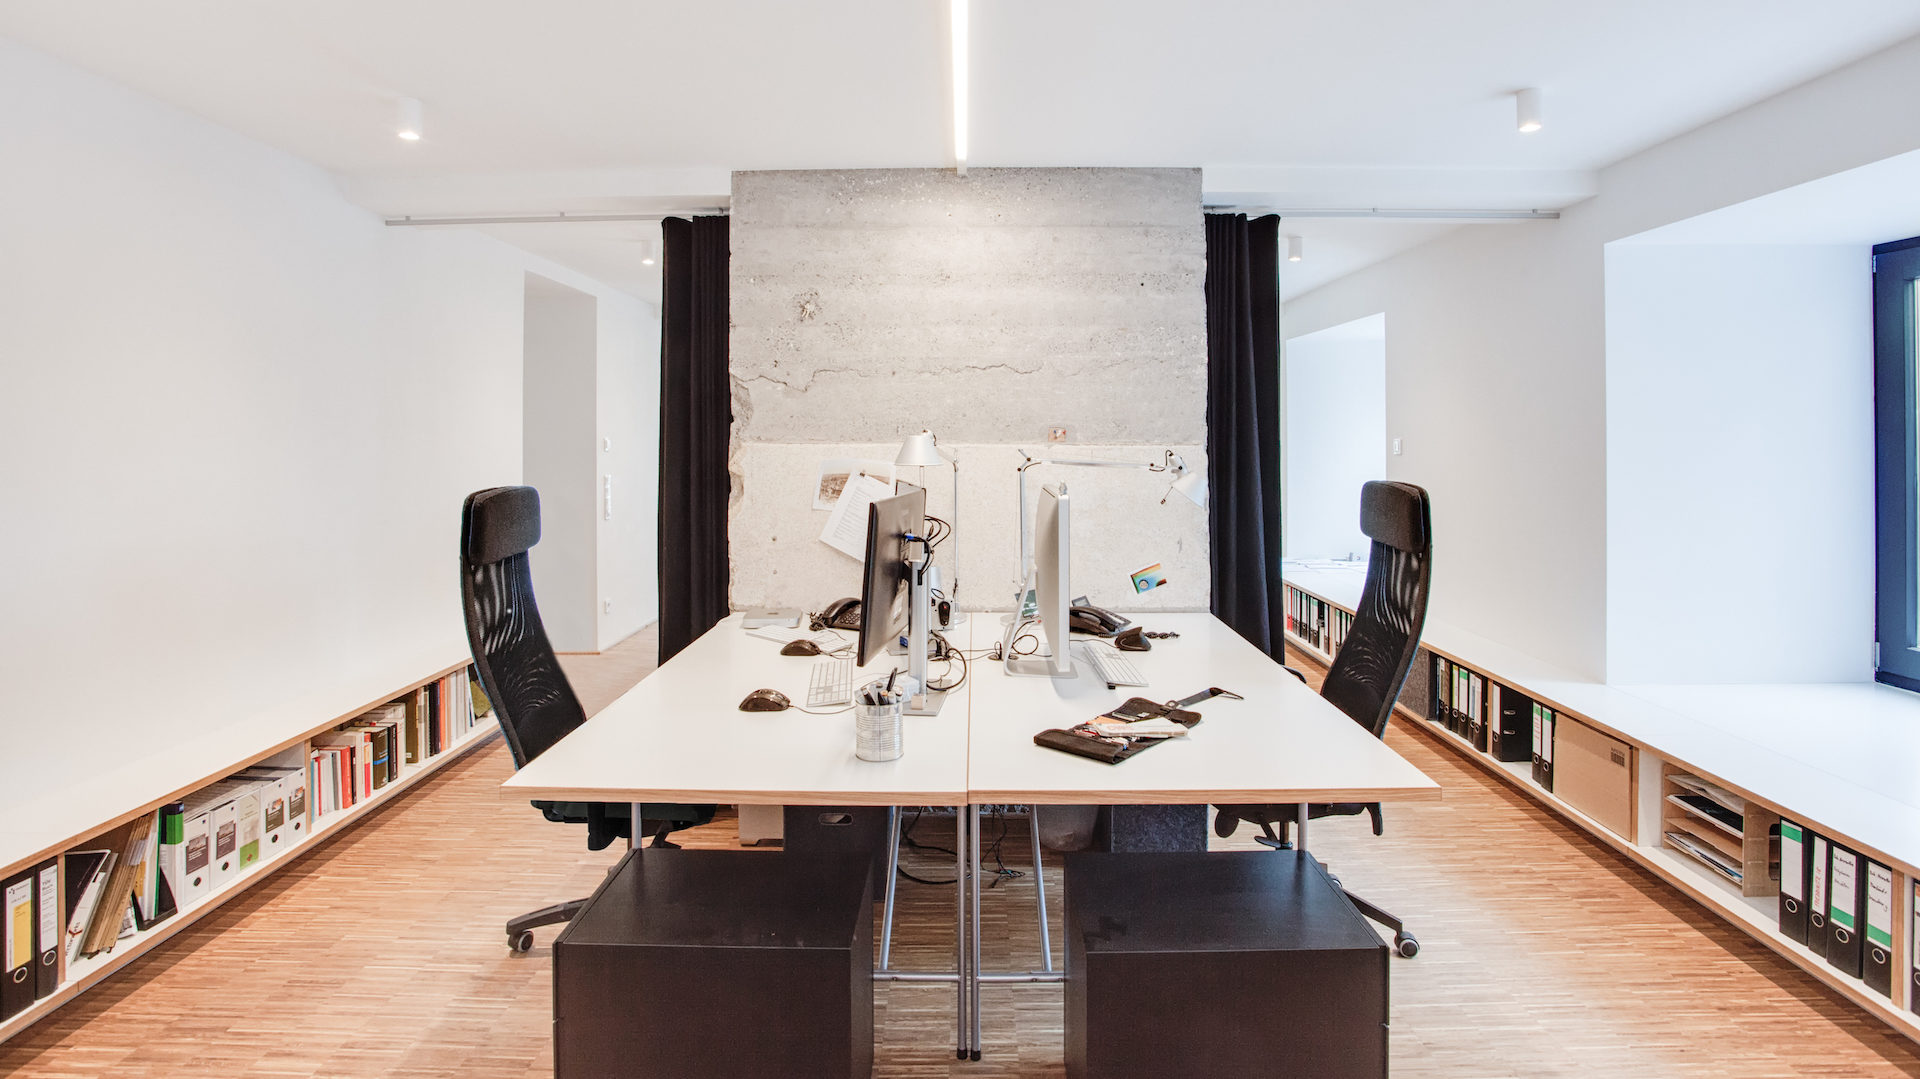 modulbüro | Architektur, Design, Kommunikation, Web